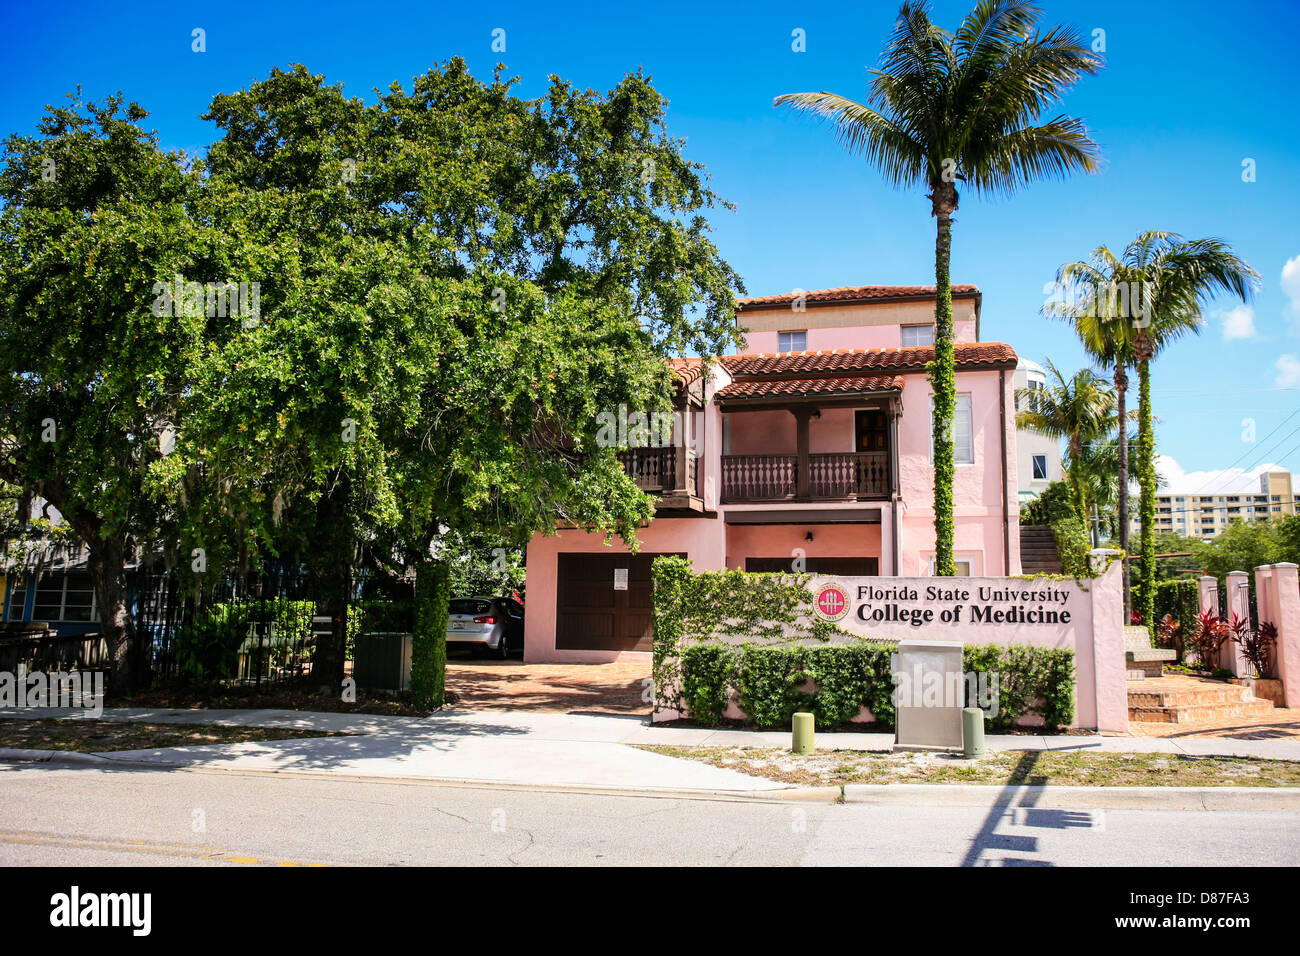 Florida State University College Of Medicine >> The Florida State University College Of Medicine In Sarasota